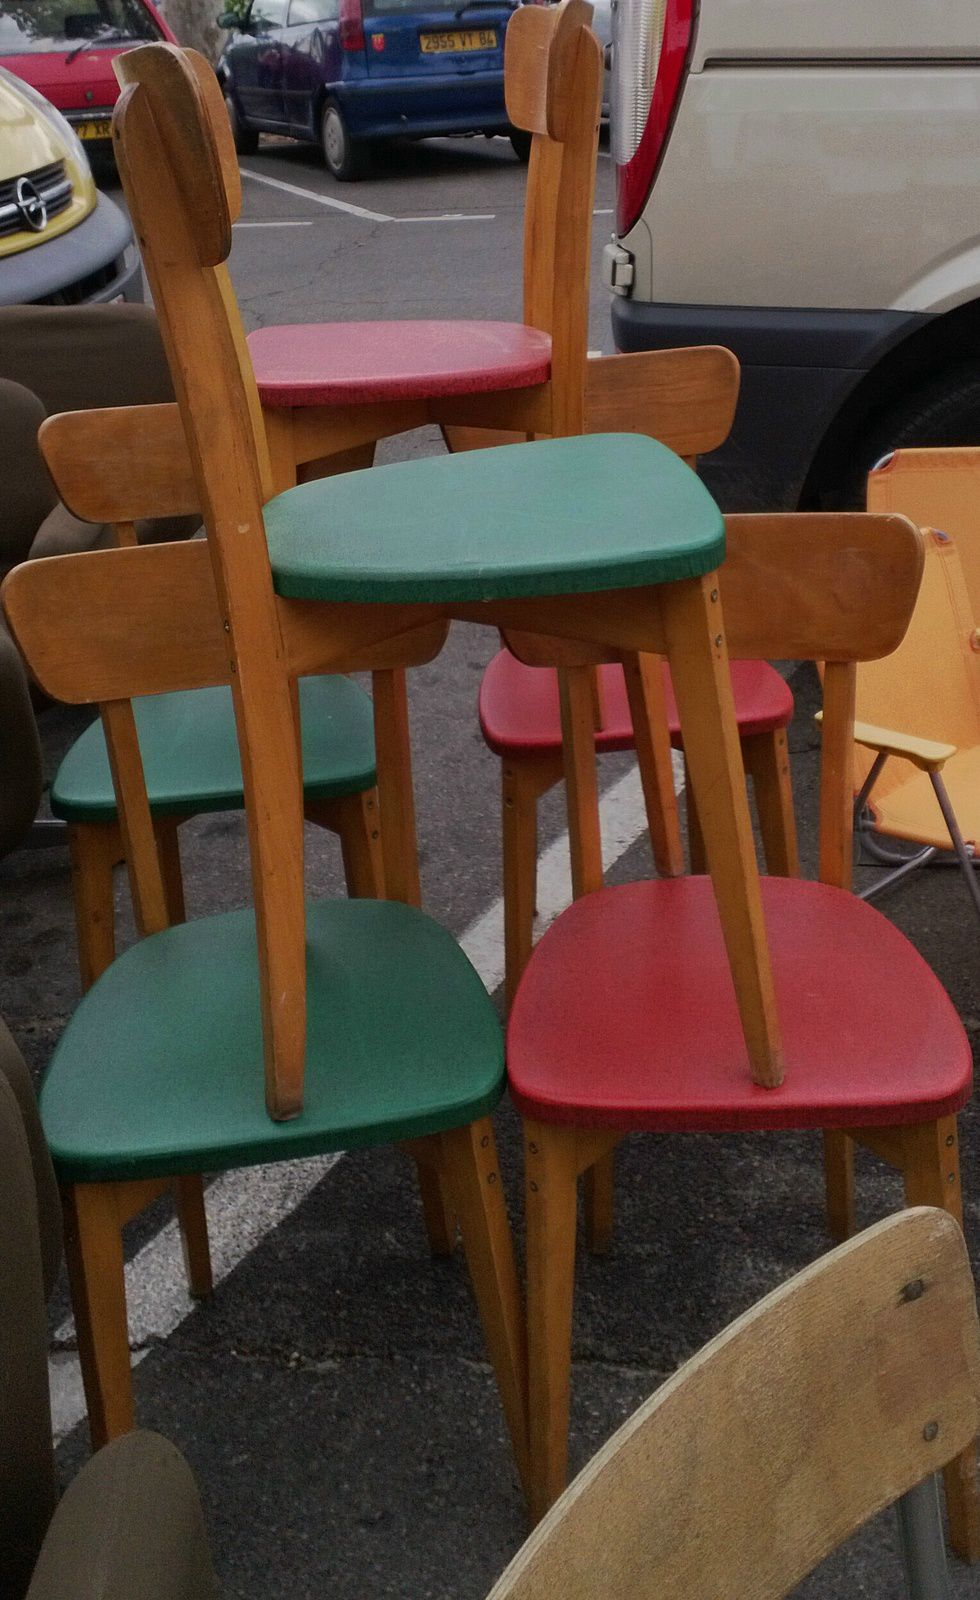 chaises bistrot vintage ann es 50 vente de mobilier vintage design scandinave ann es 50 60 70. Black Bedroom Furniture Sets. Home Design Ideas